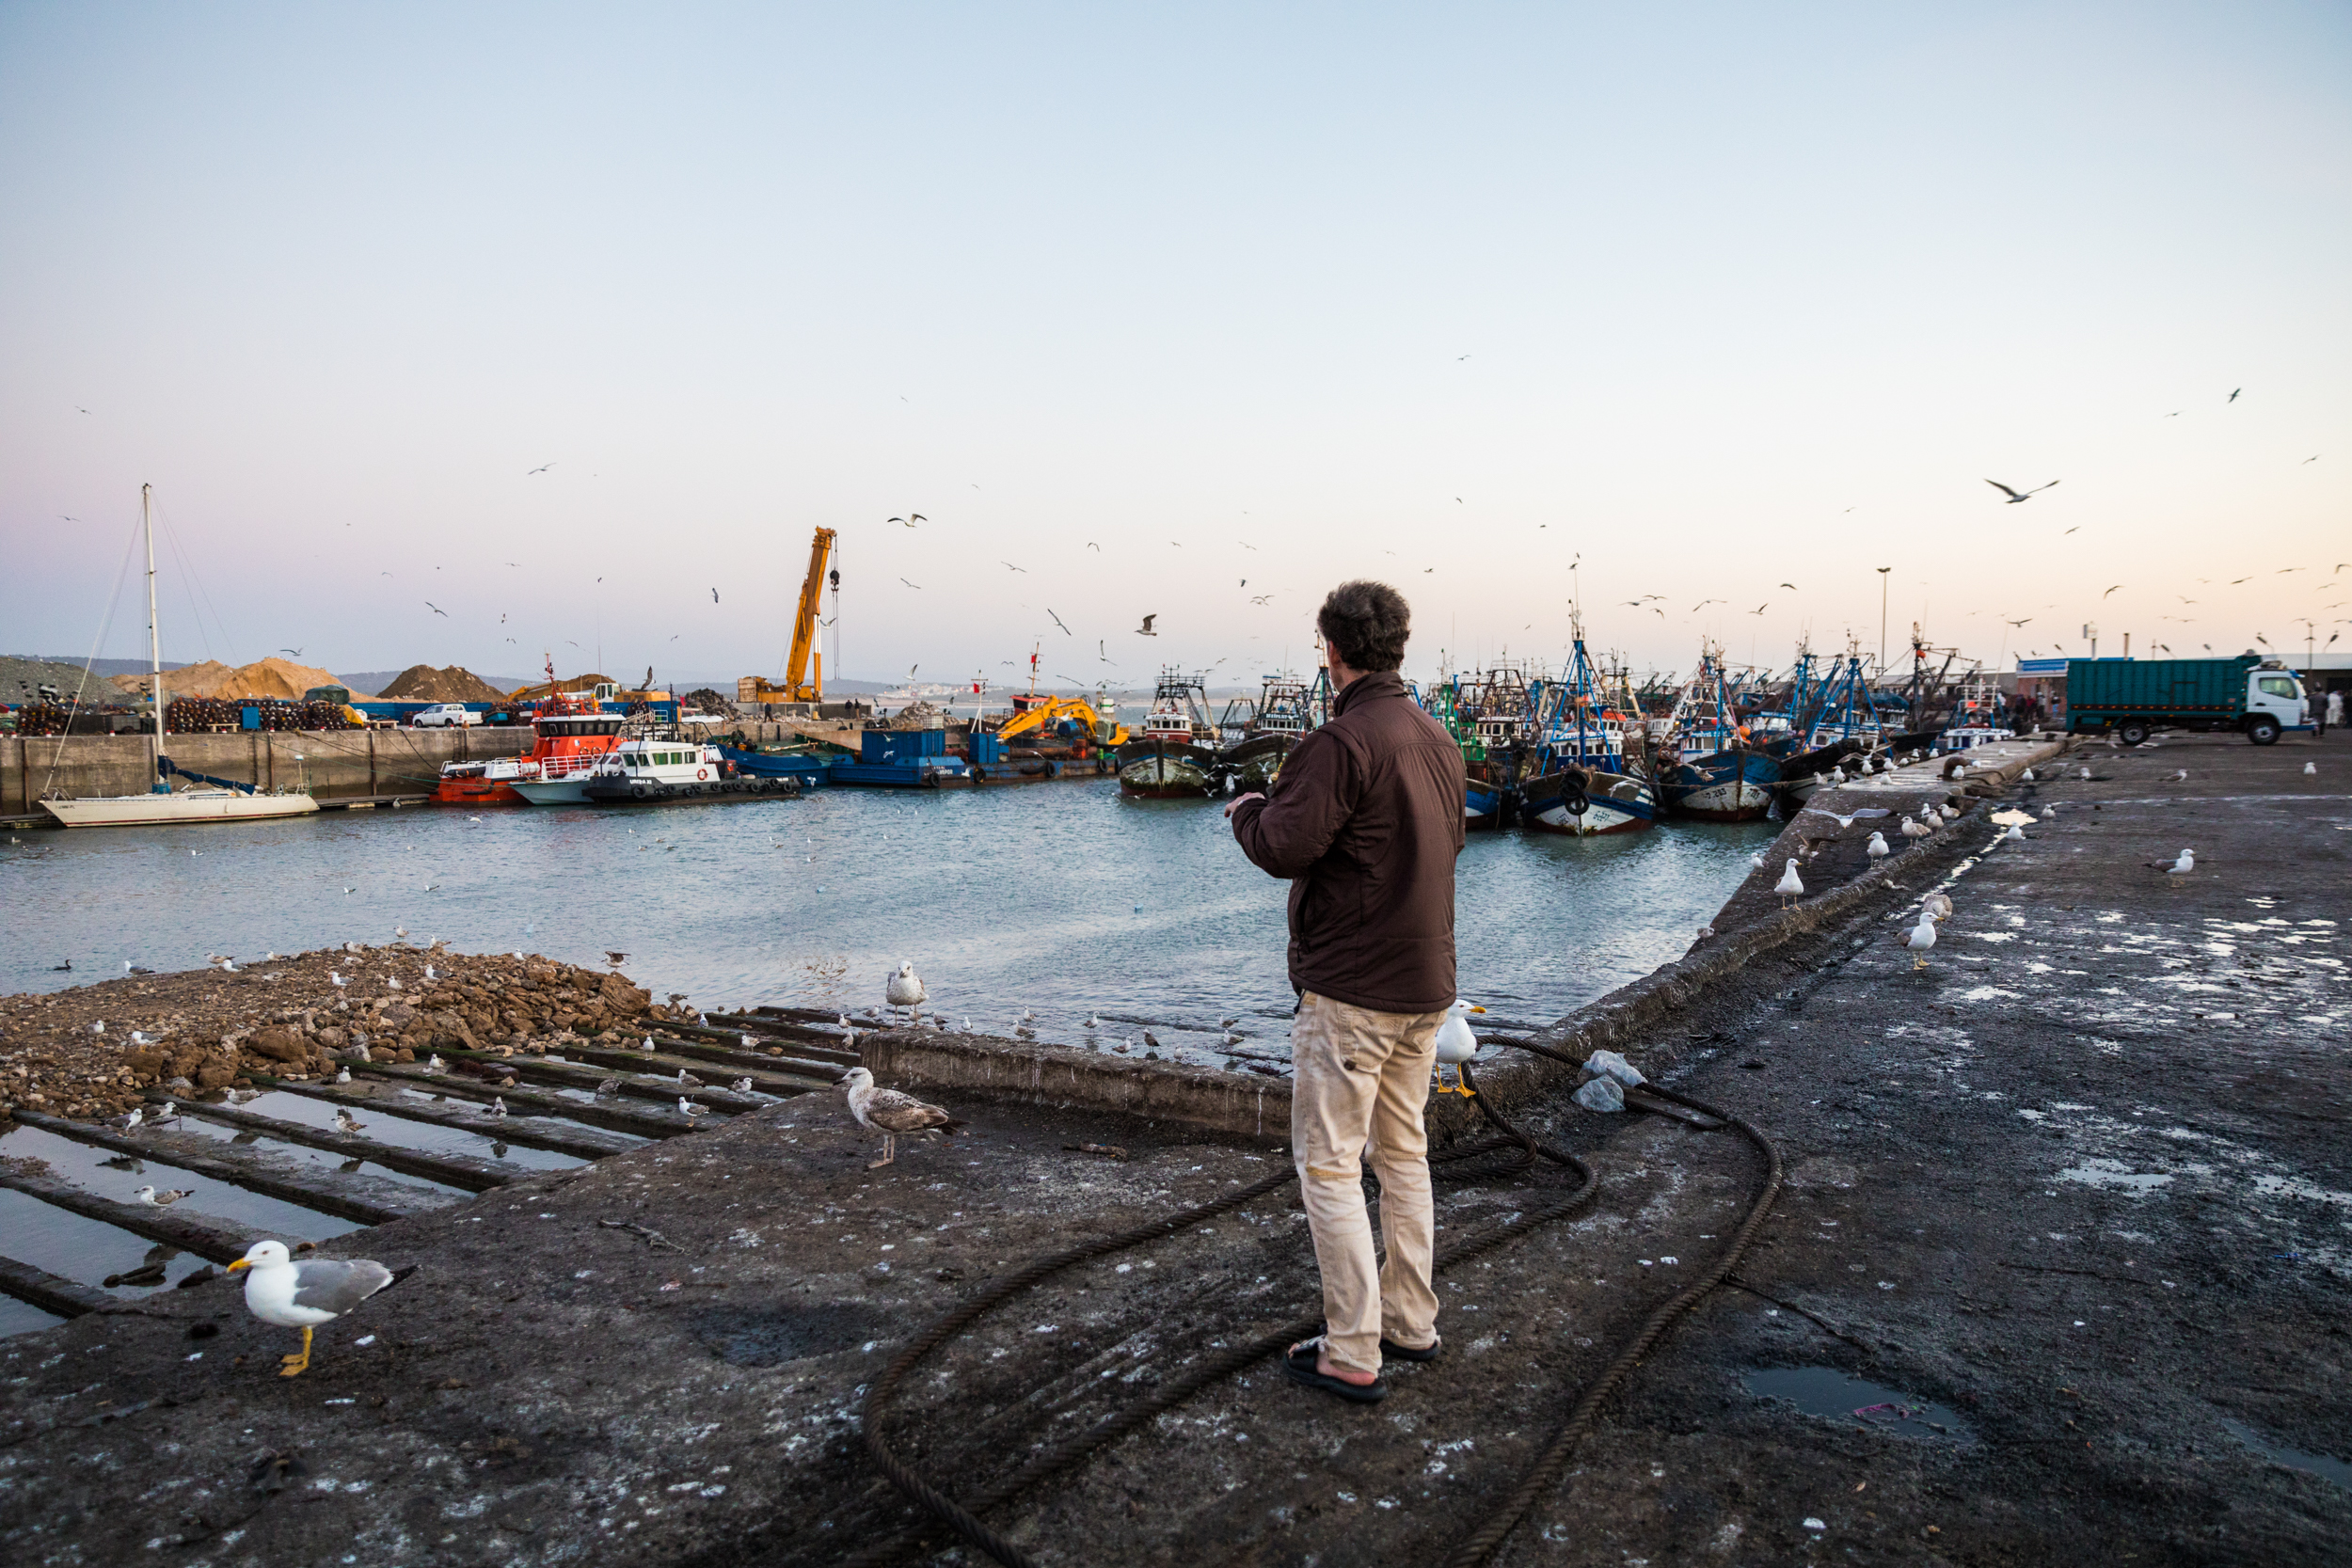 Colin_Herrington_Maroc_Stories-55.jpg